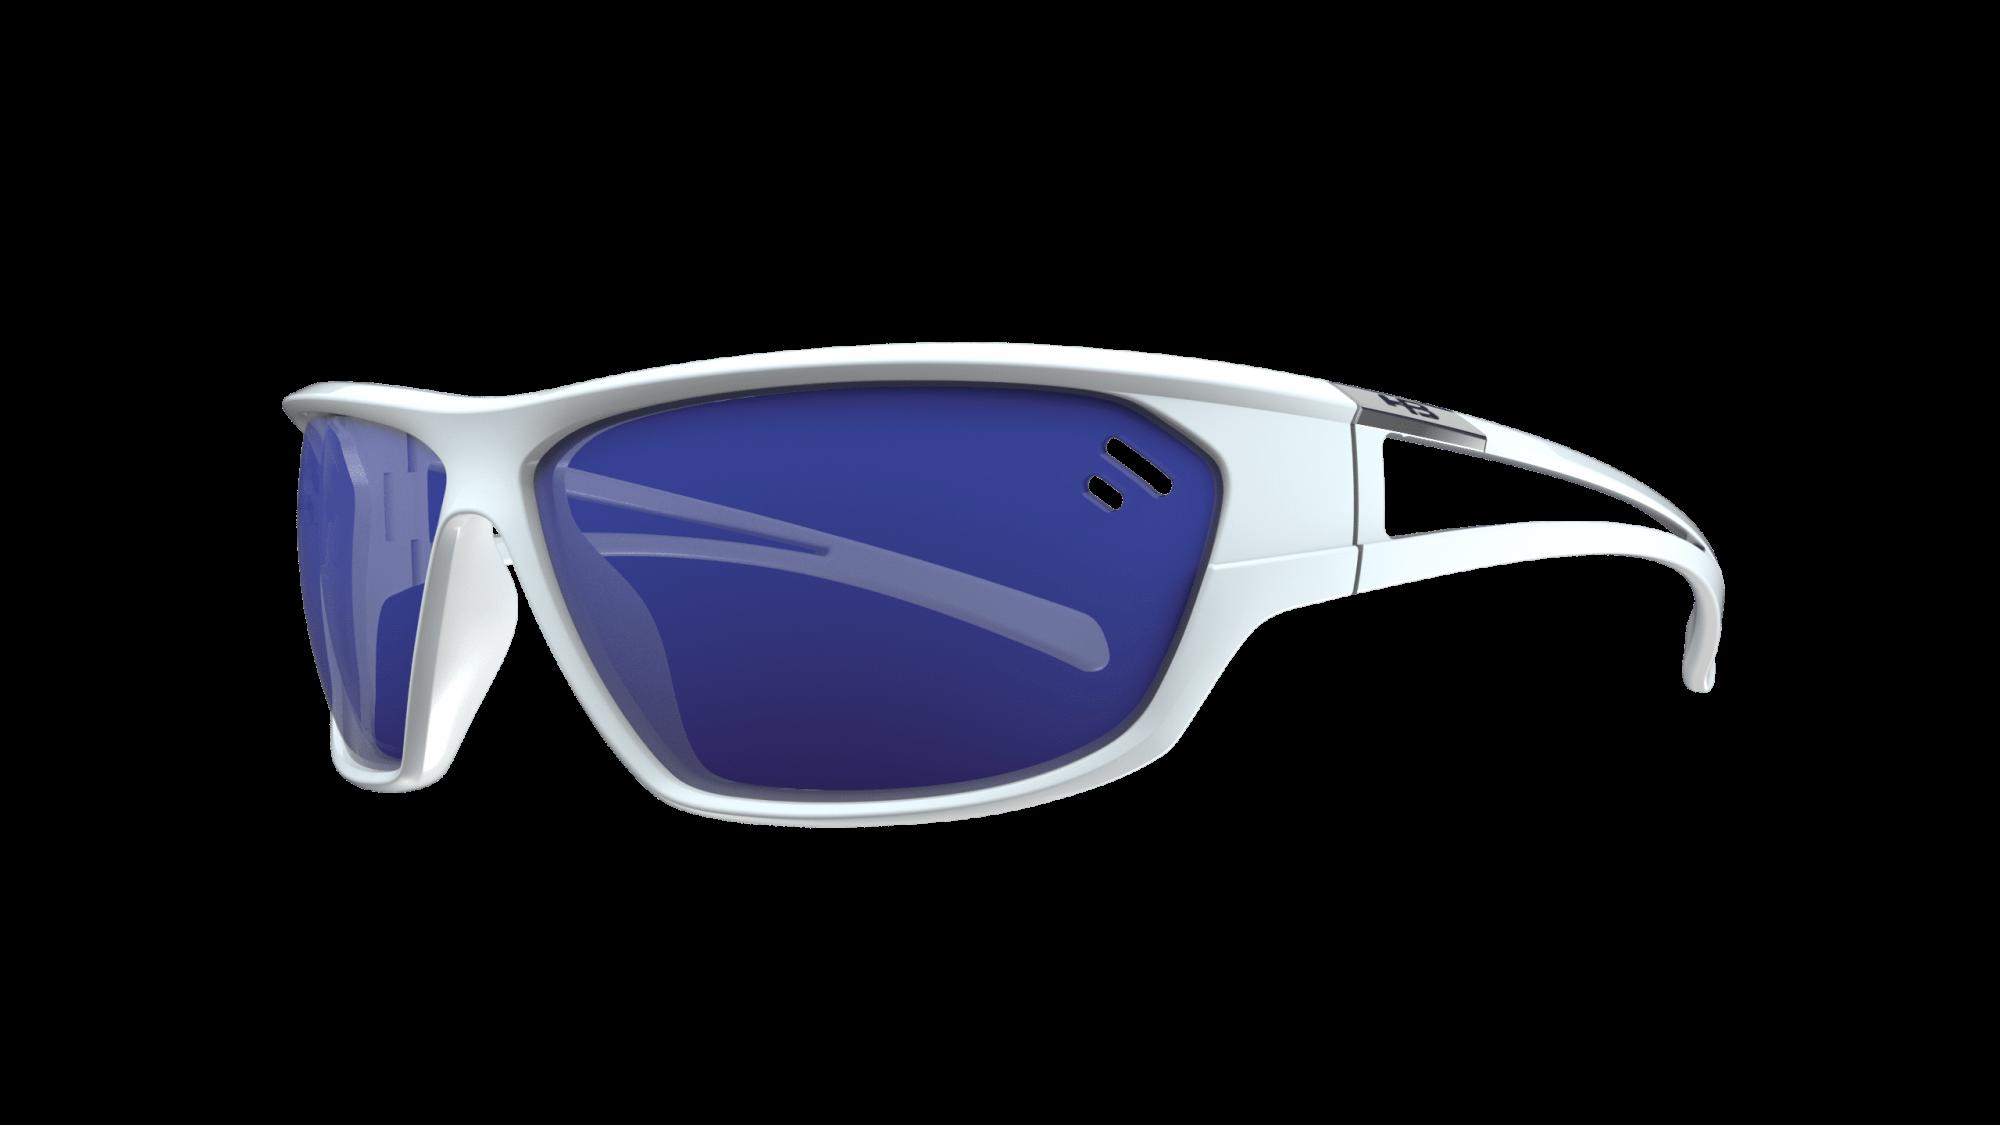 Óculos Flip HB Pearled White Blue Chrome